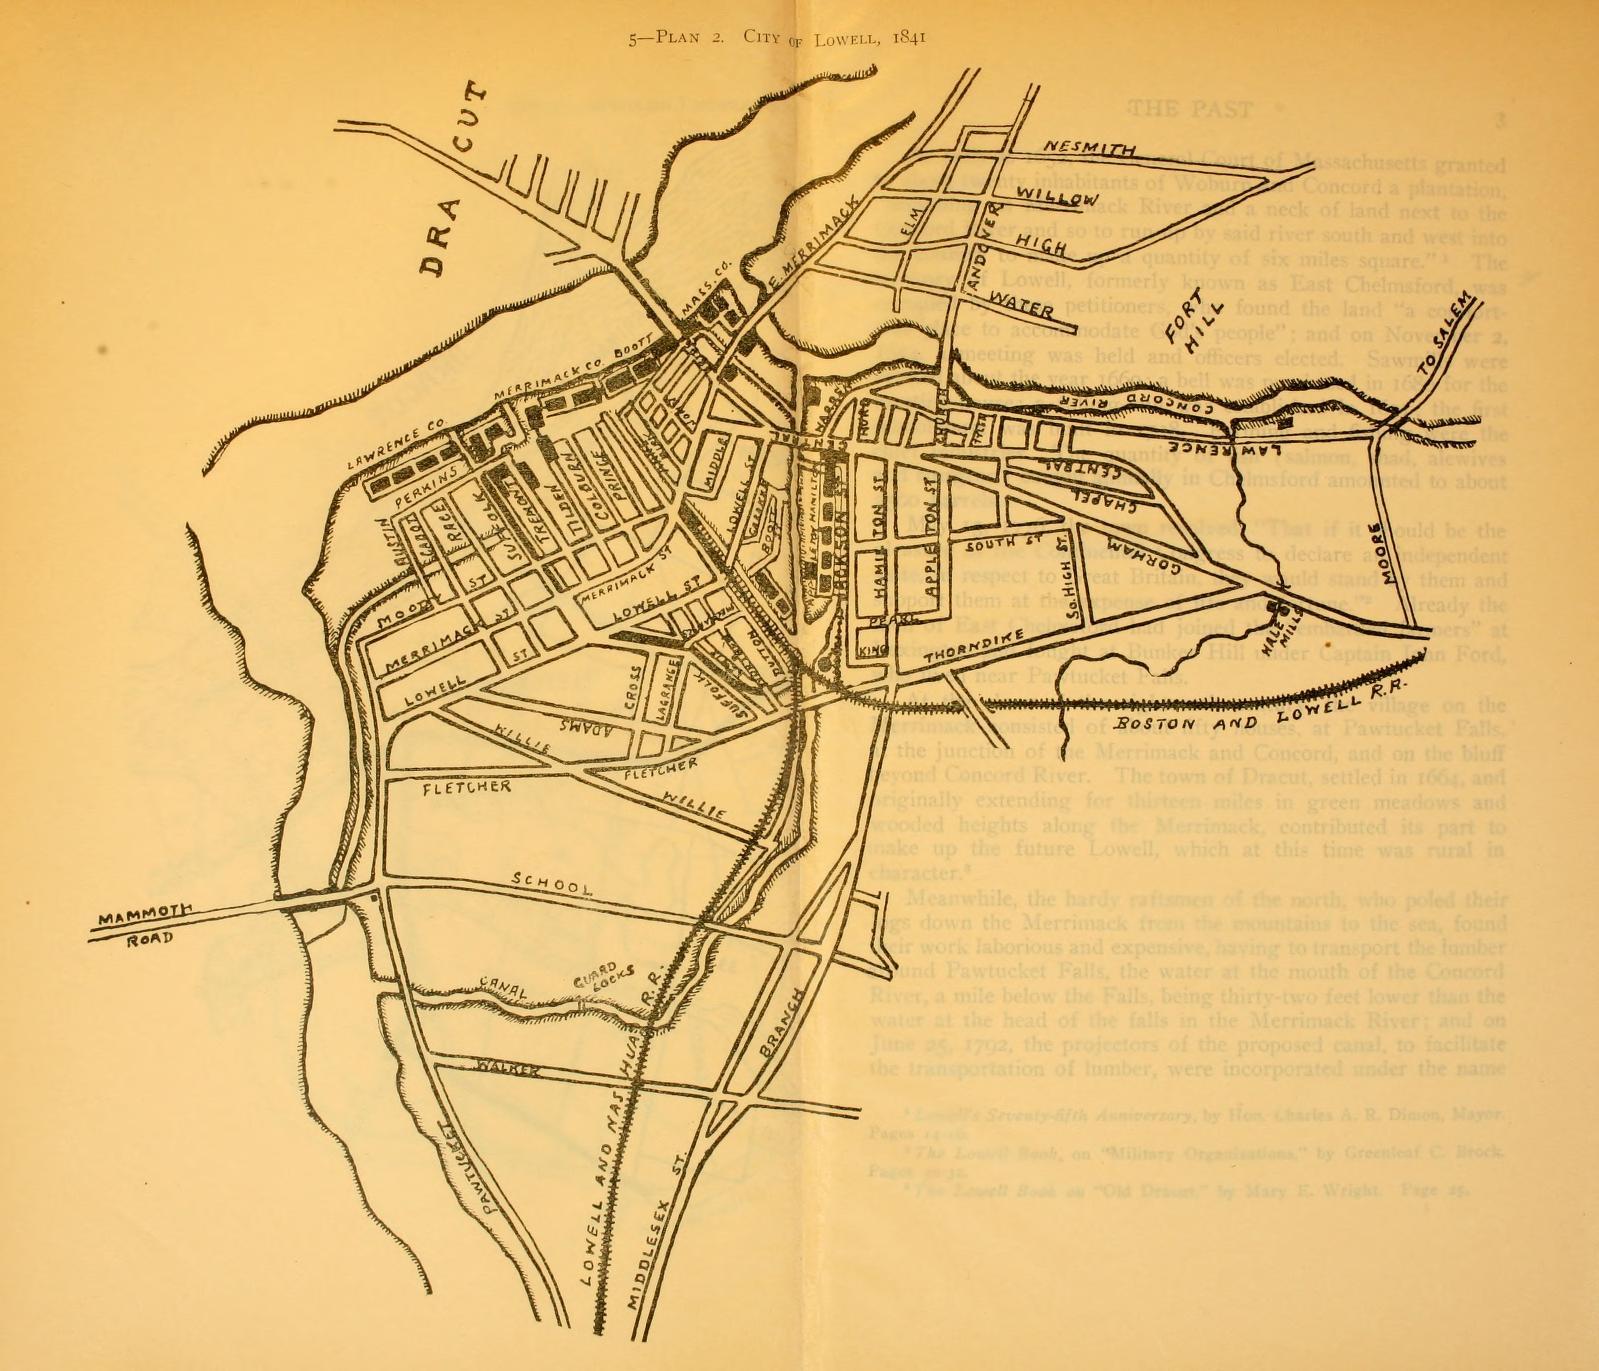 Lowell Machusetts Genealogy | Access Genealogy on city street map manhattan ny, city street map jackson tn, city street map lincoln ne, city street map londonderry nh, city street map frankfort ky,